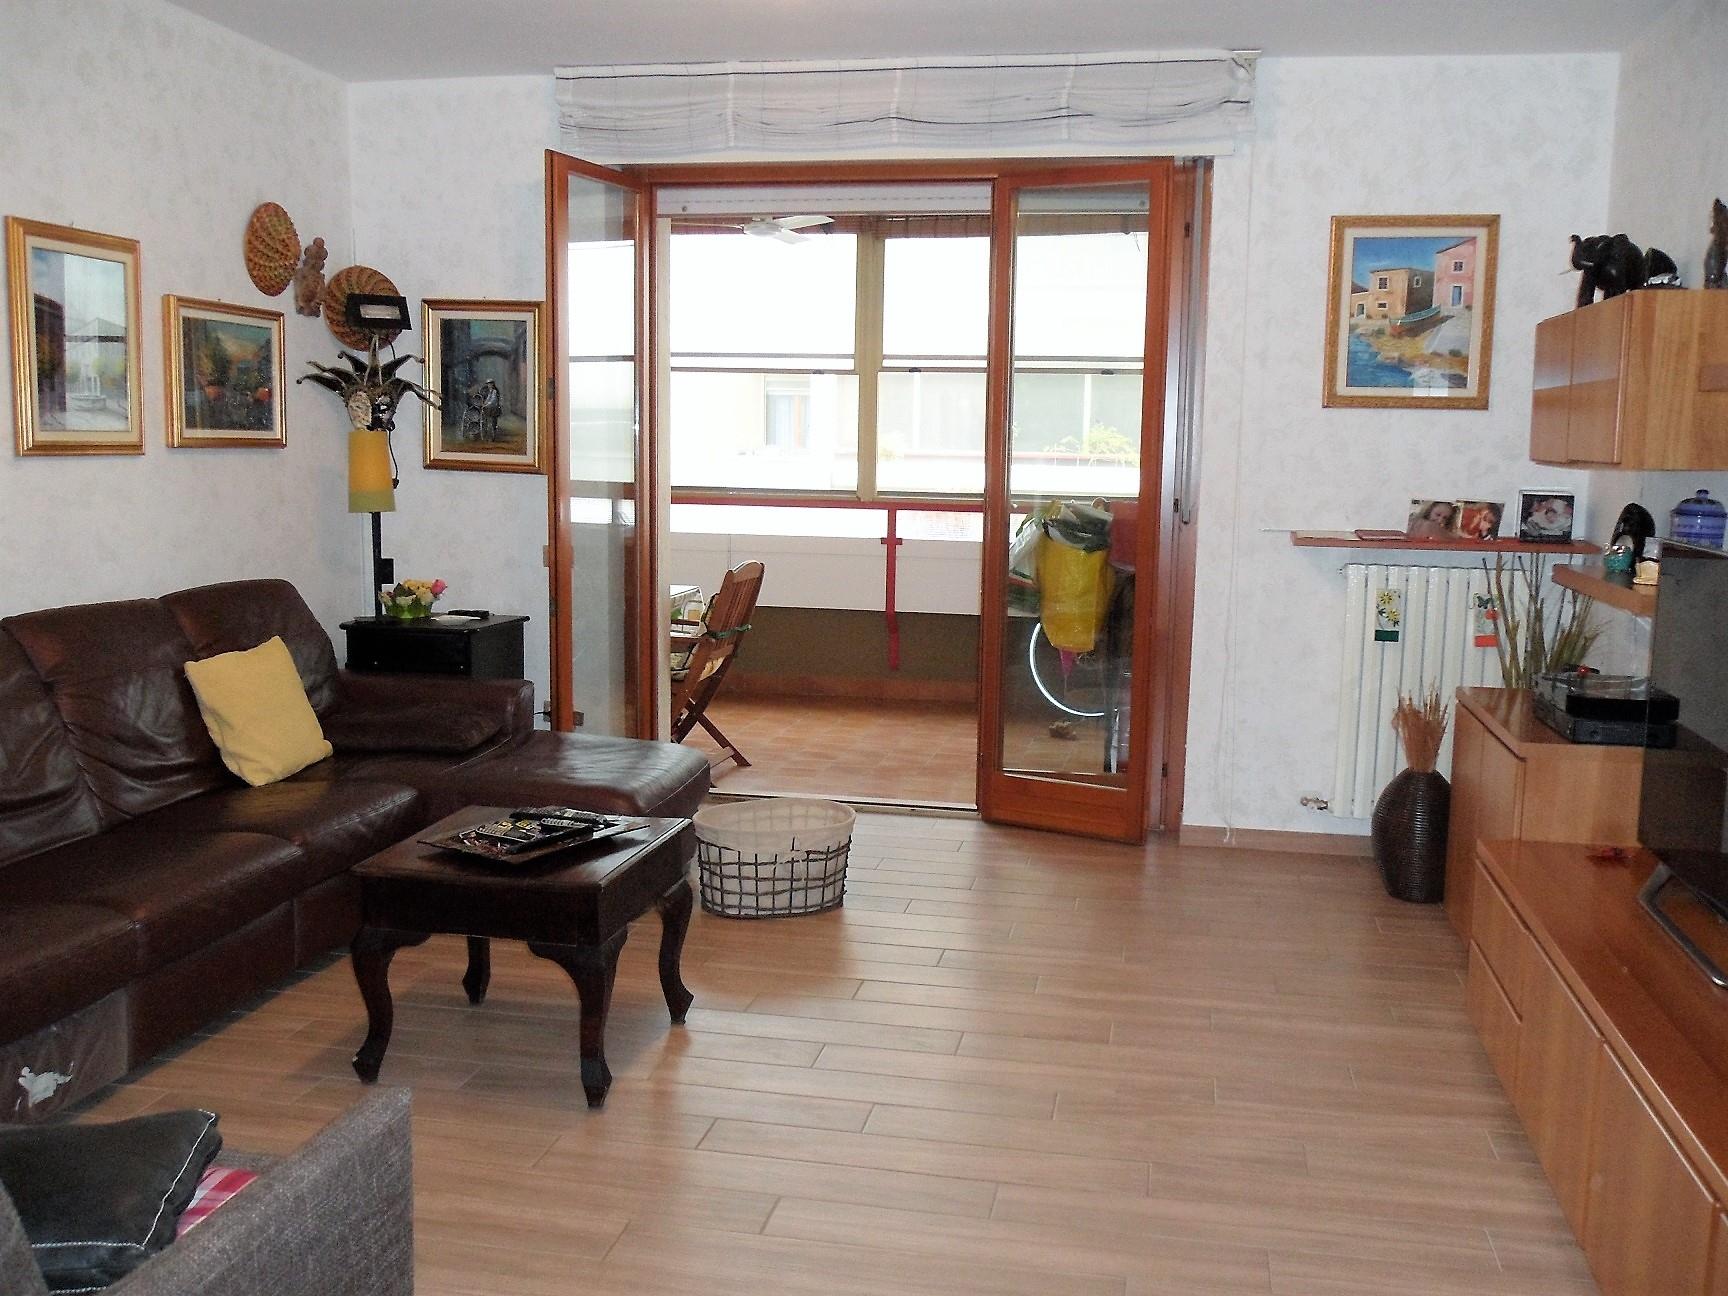 Pieve Emanuele | Appartamento in Vendita in via delle rose | lacasadimilano.it